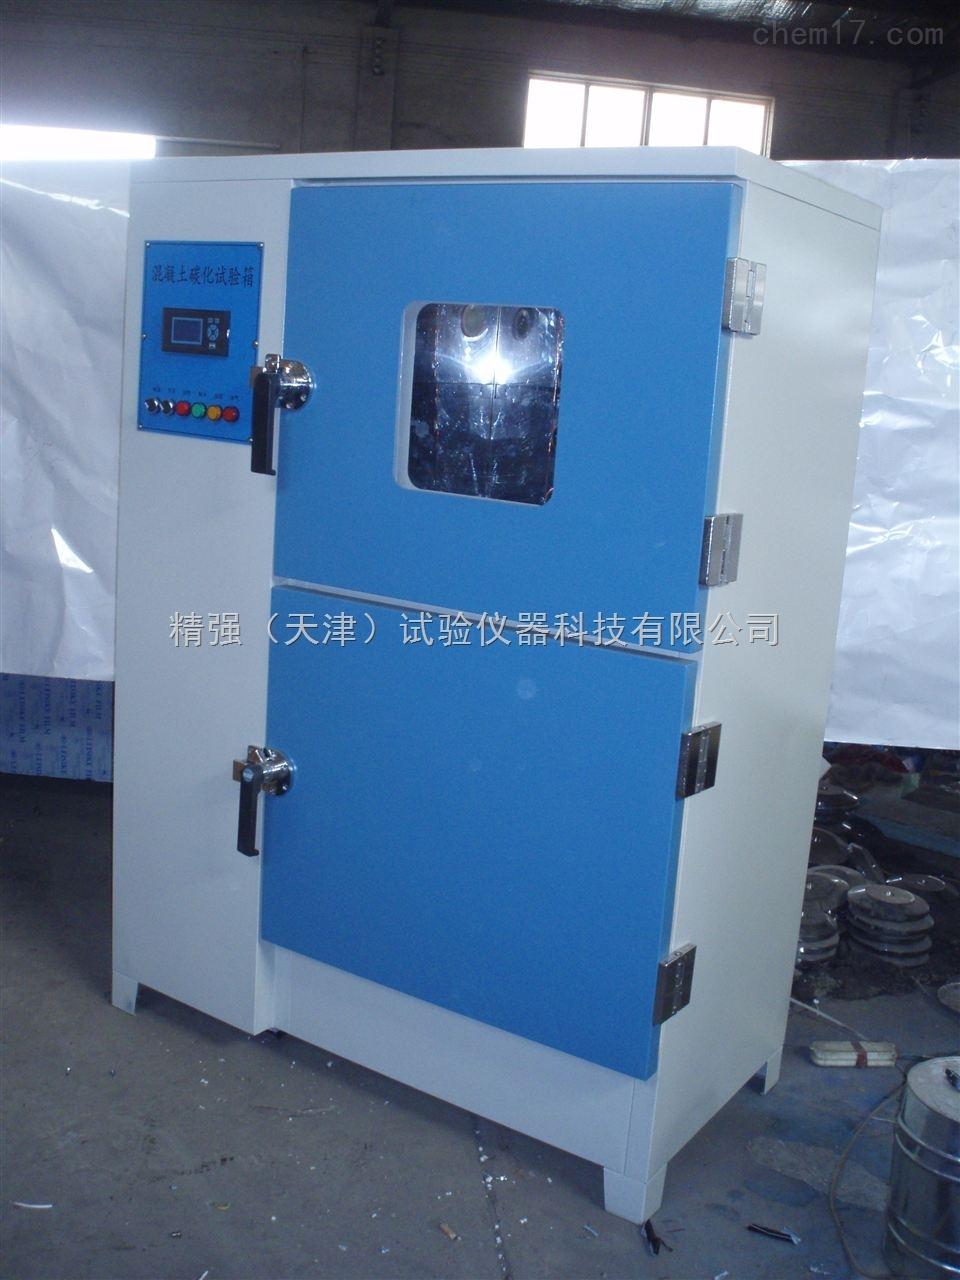 TH-B-触摸屏碳化试验箱